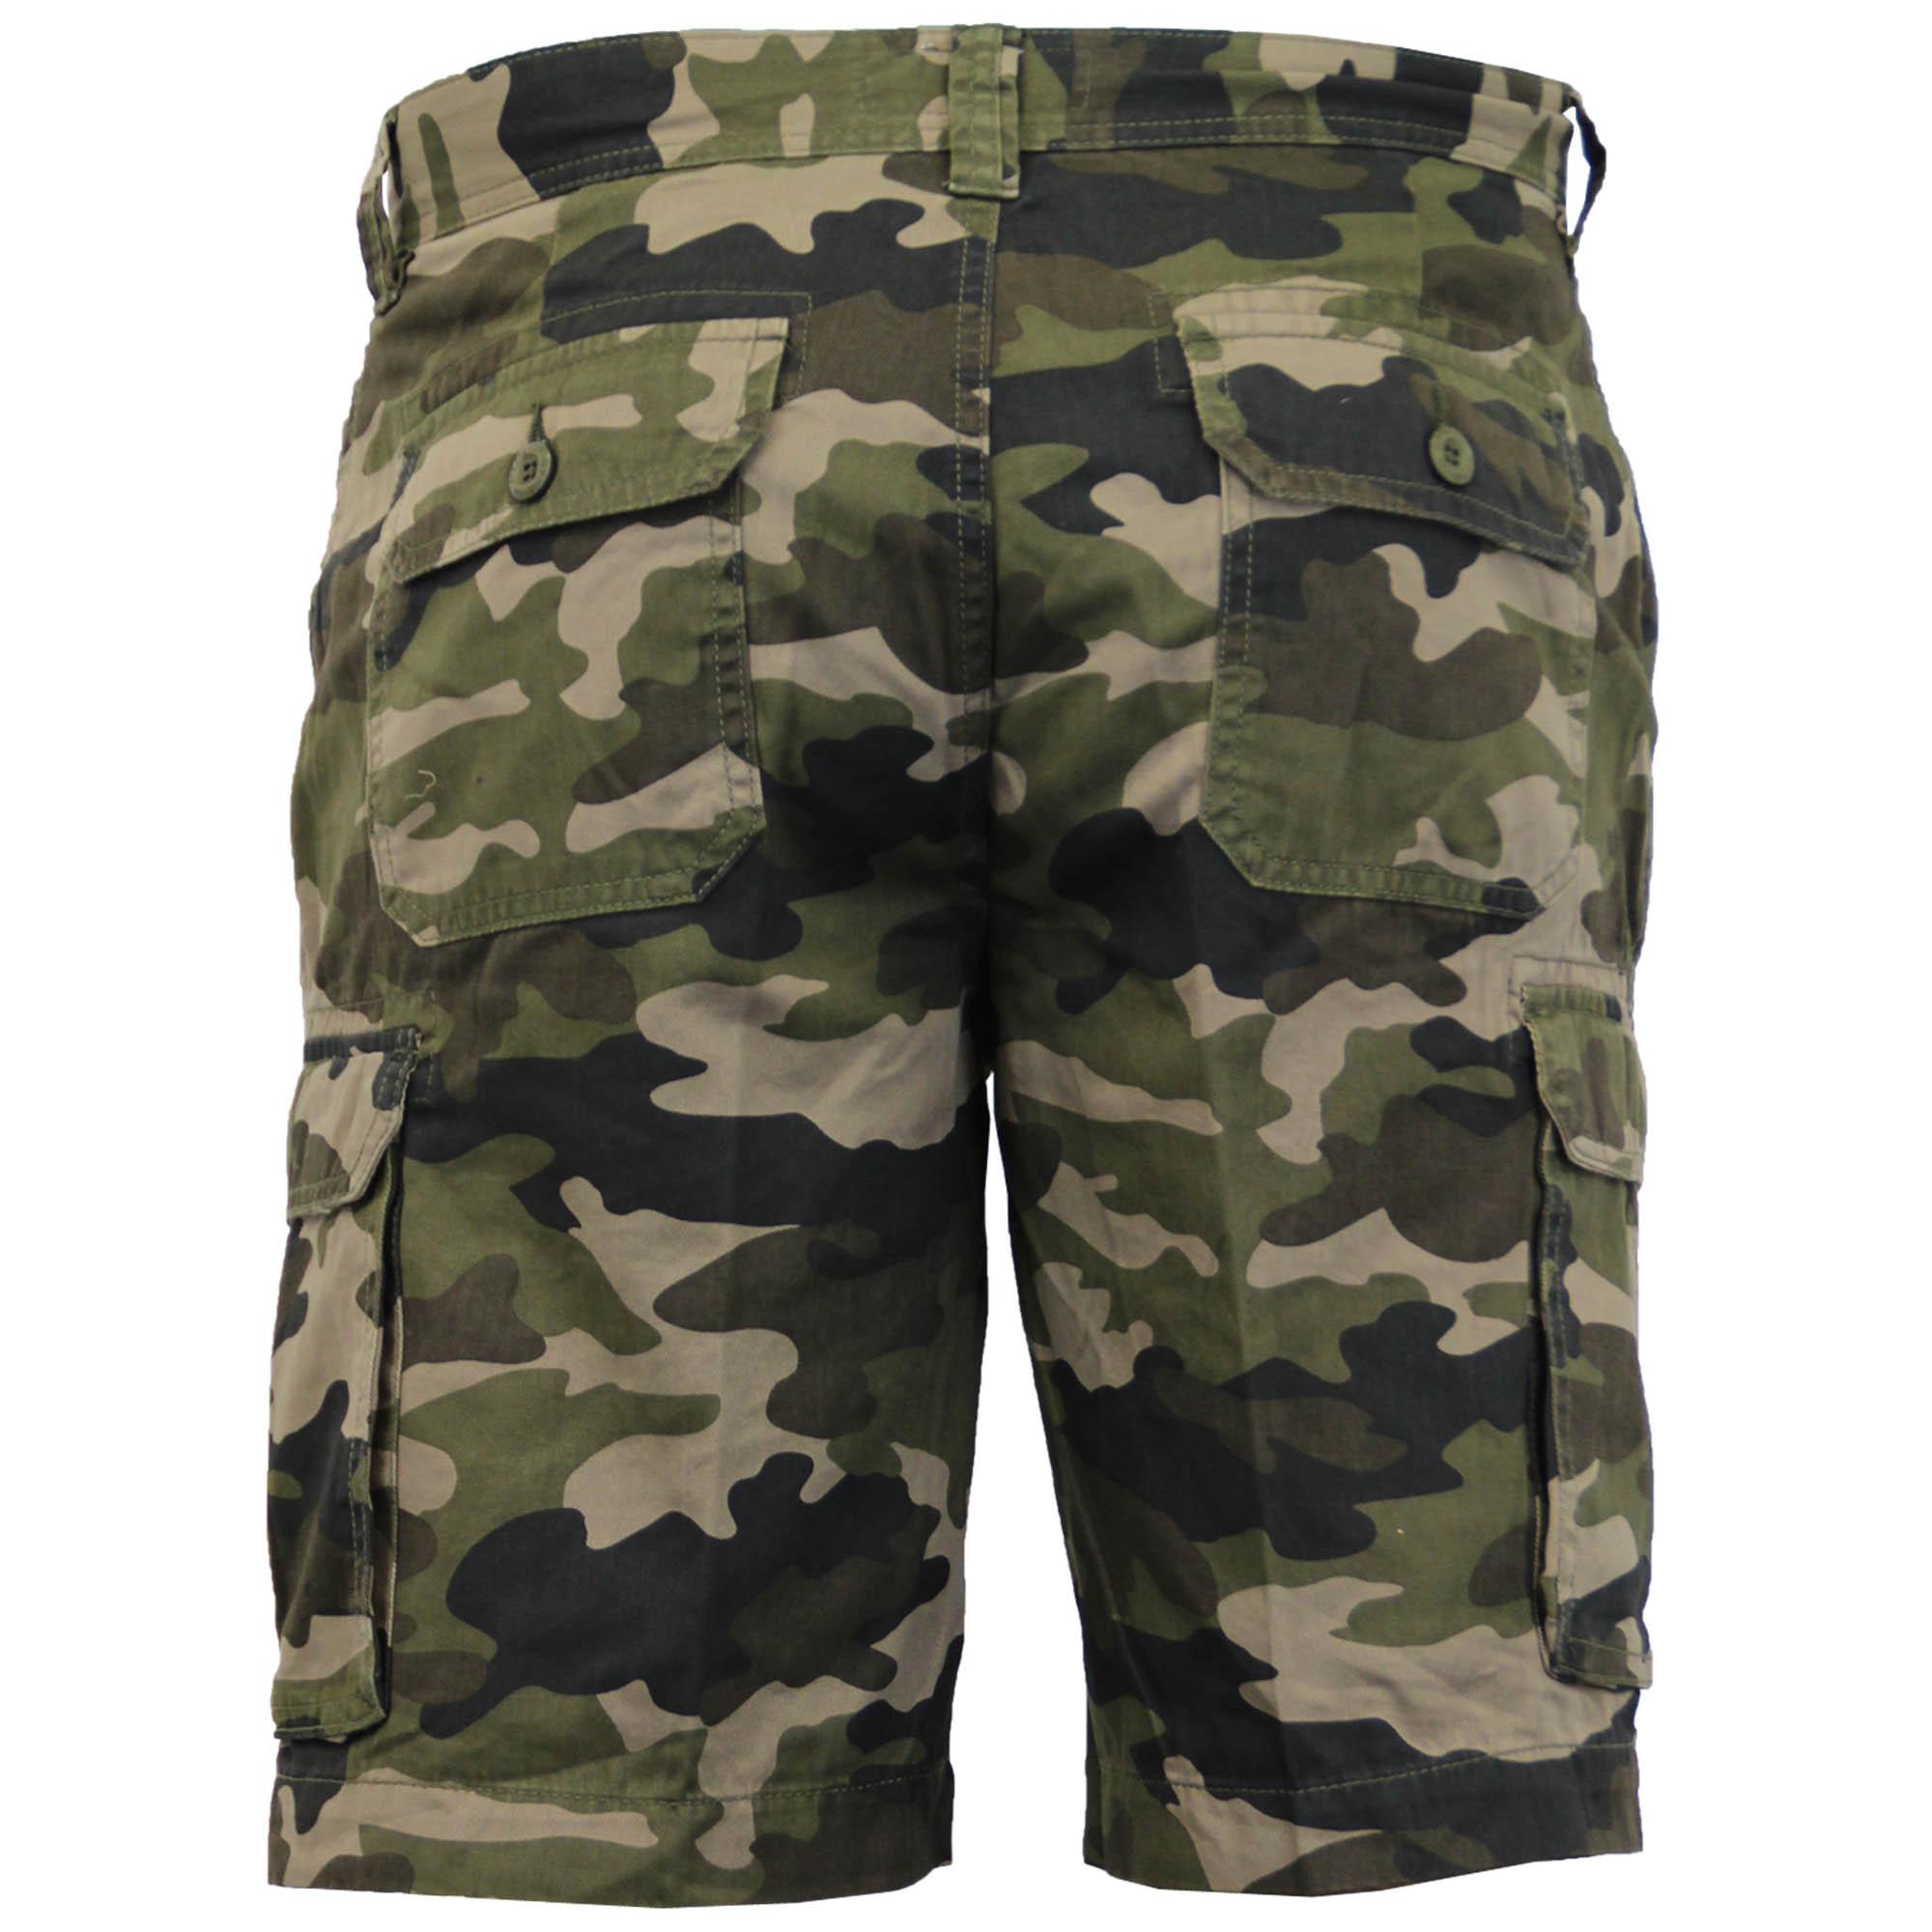 camouflage homme short militaire combat longueur genou arm e westace t neuf ebay. Black Bedroom Furniture Sets. Home Design Ideas